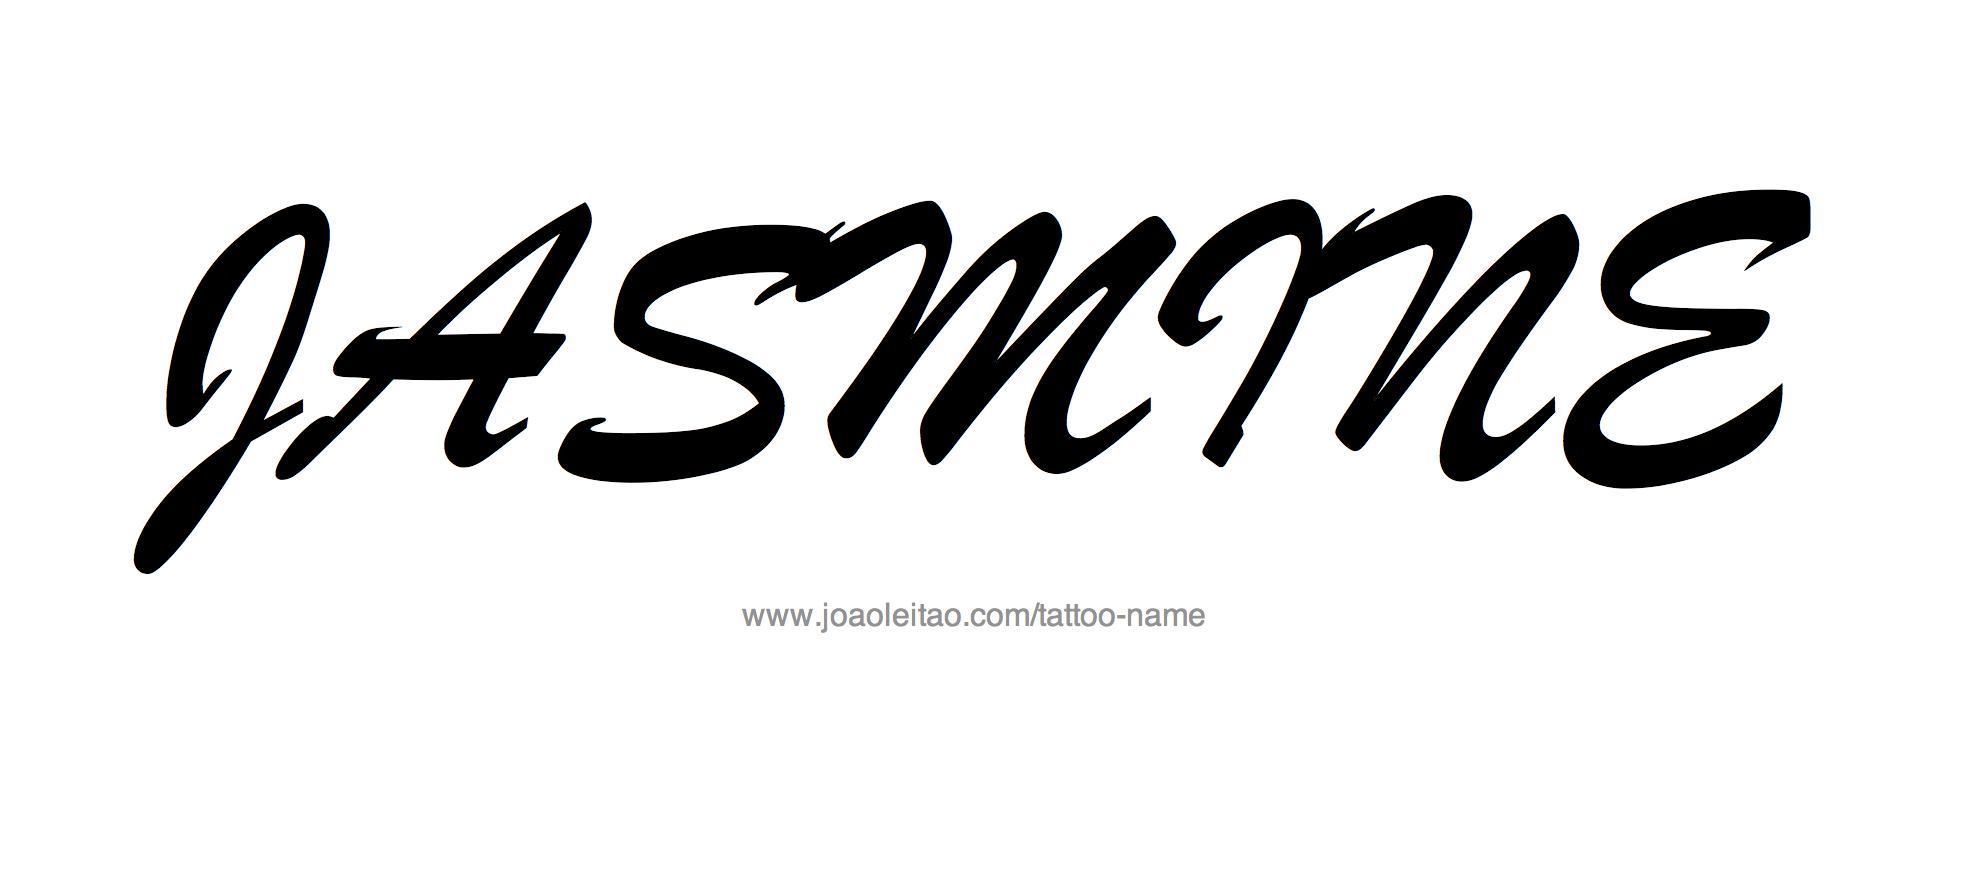 top abigail name meaning images for pinterest tattoos. Black Bedroom Furniture Sets. Home Design Ideas